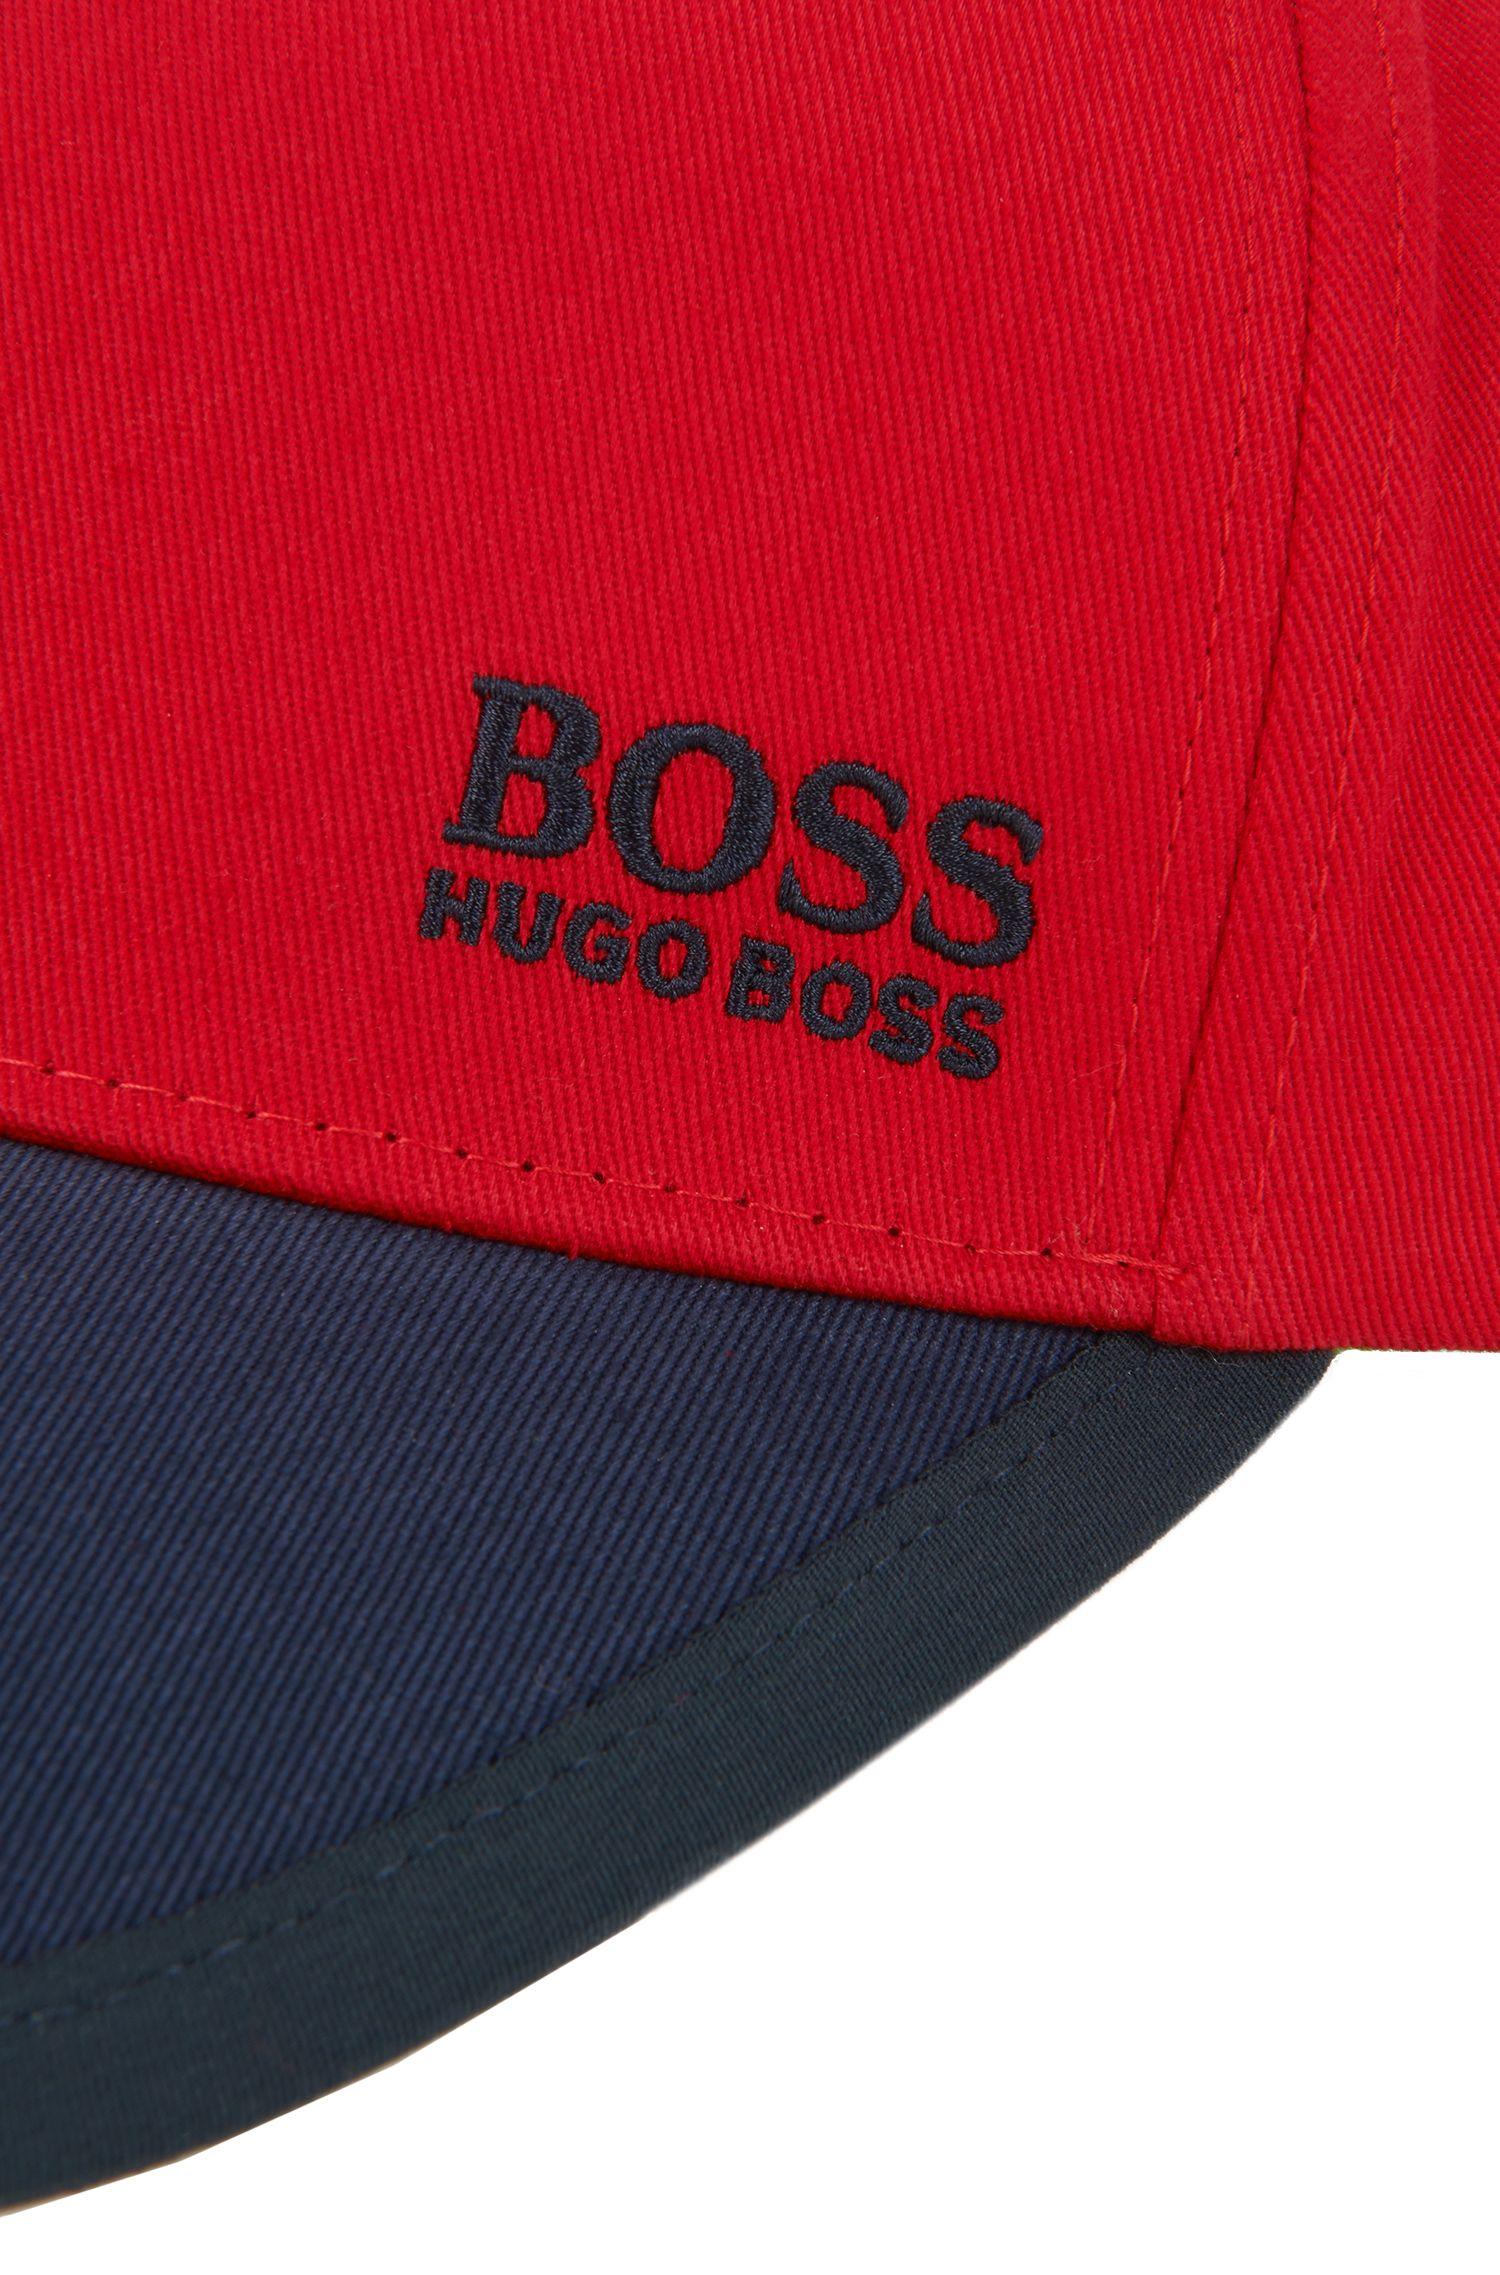 Cotton Baseball Cap | Cap , Red